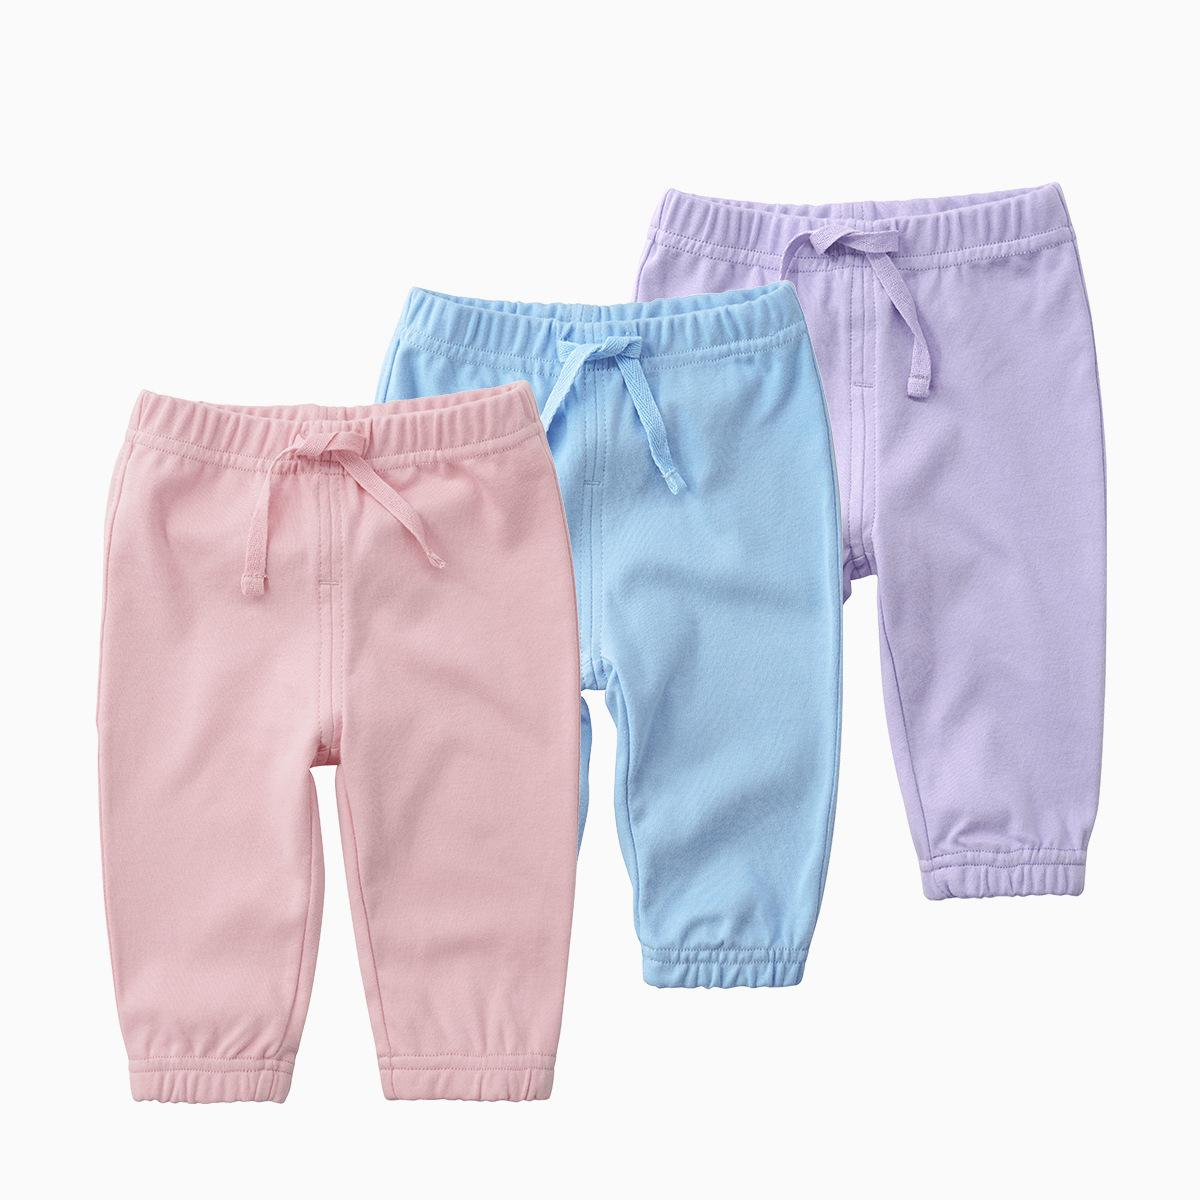 Baby Pants Newborn Children Pure Cotton Pants Infant Baby Leggings Spring Soft  Toddler Girl Pants 8 Colors